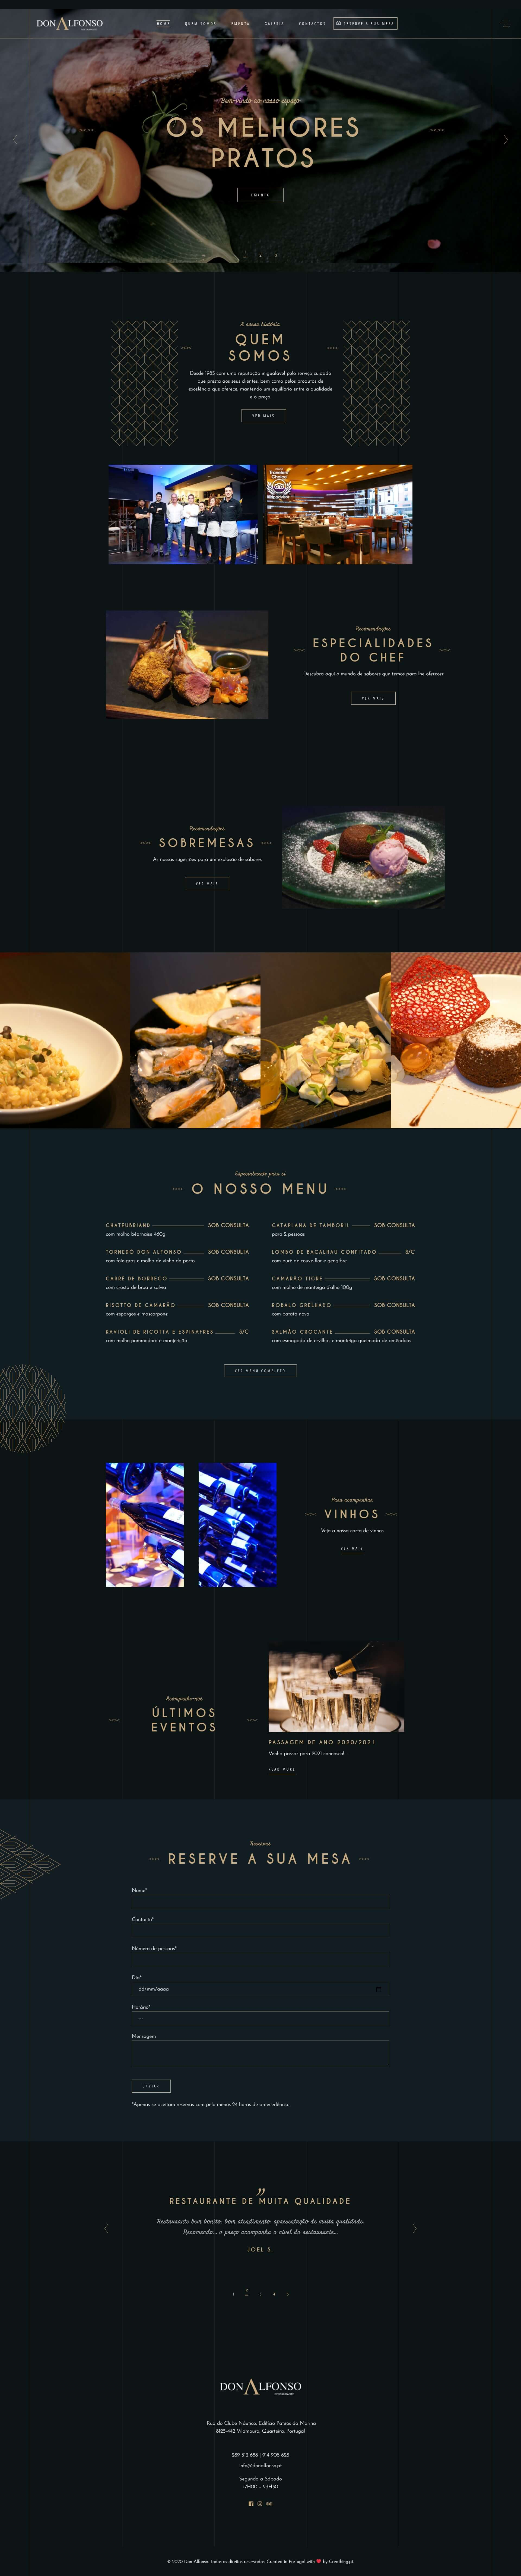 Website desenvolvido emWordPress para o restaurante Don Alfonso